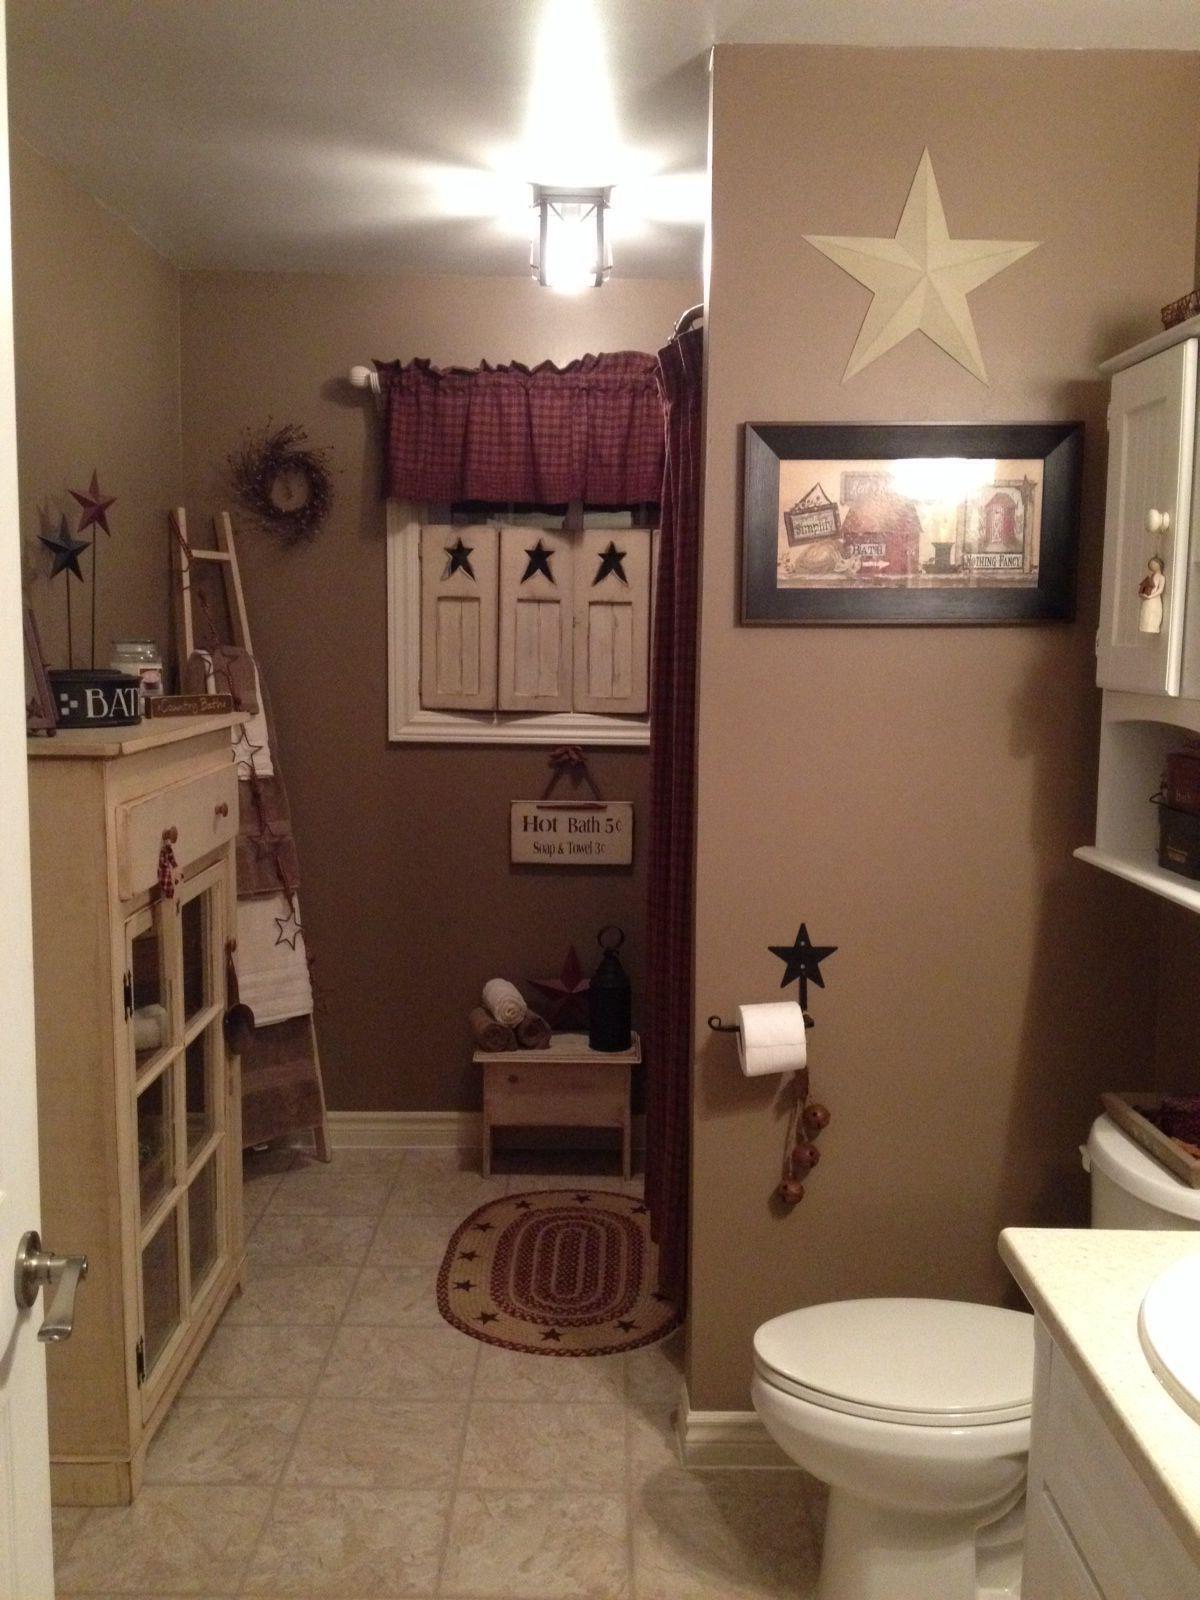 Primitive bathroom  Home decor  Decorating  Rustic  Country